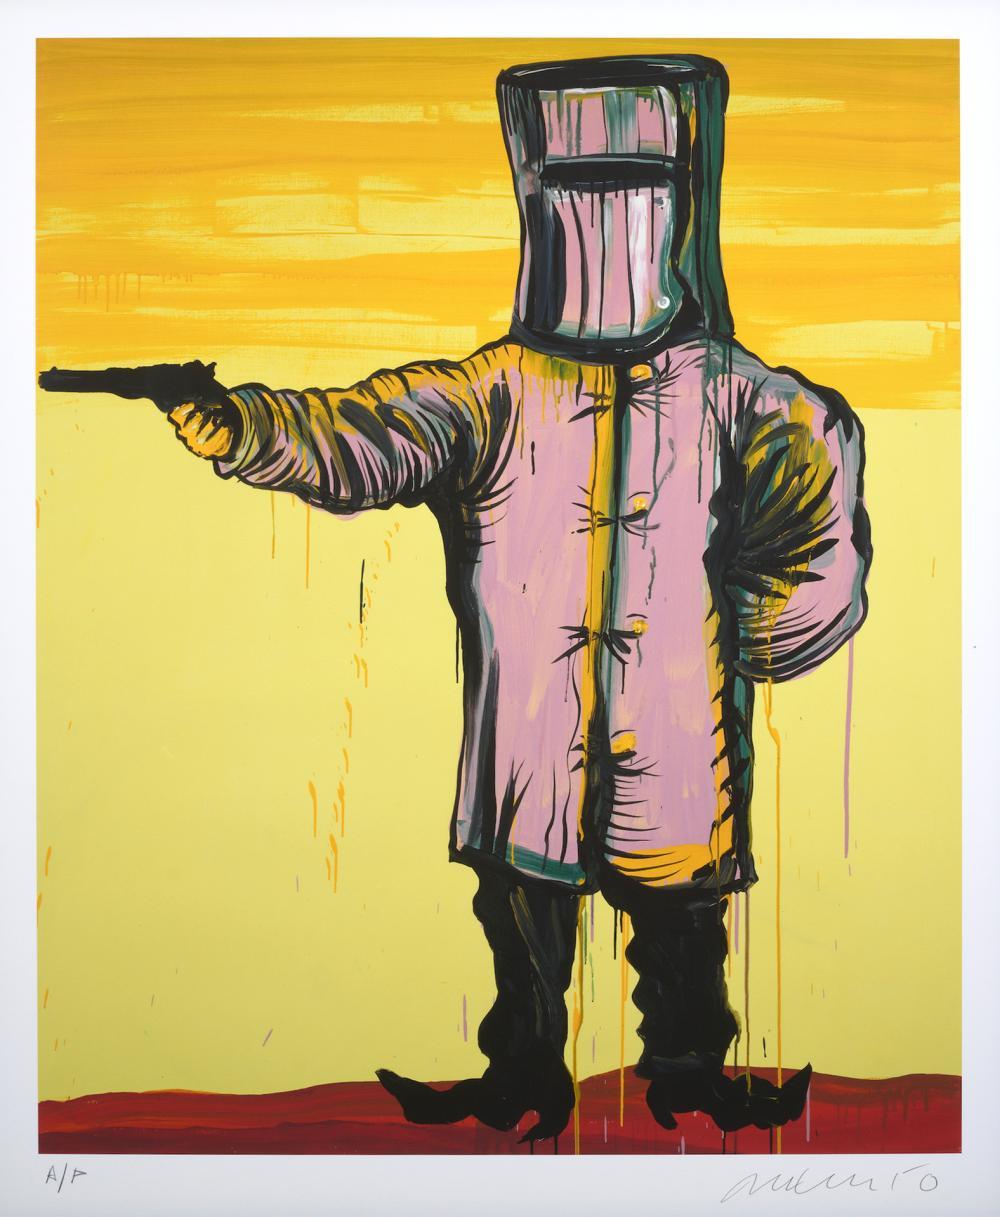 § ADAM CULLEN (1965-2012) Edward Kelly at Glenrowan 2010 archival pigment print, ed. A/P